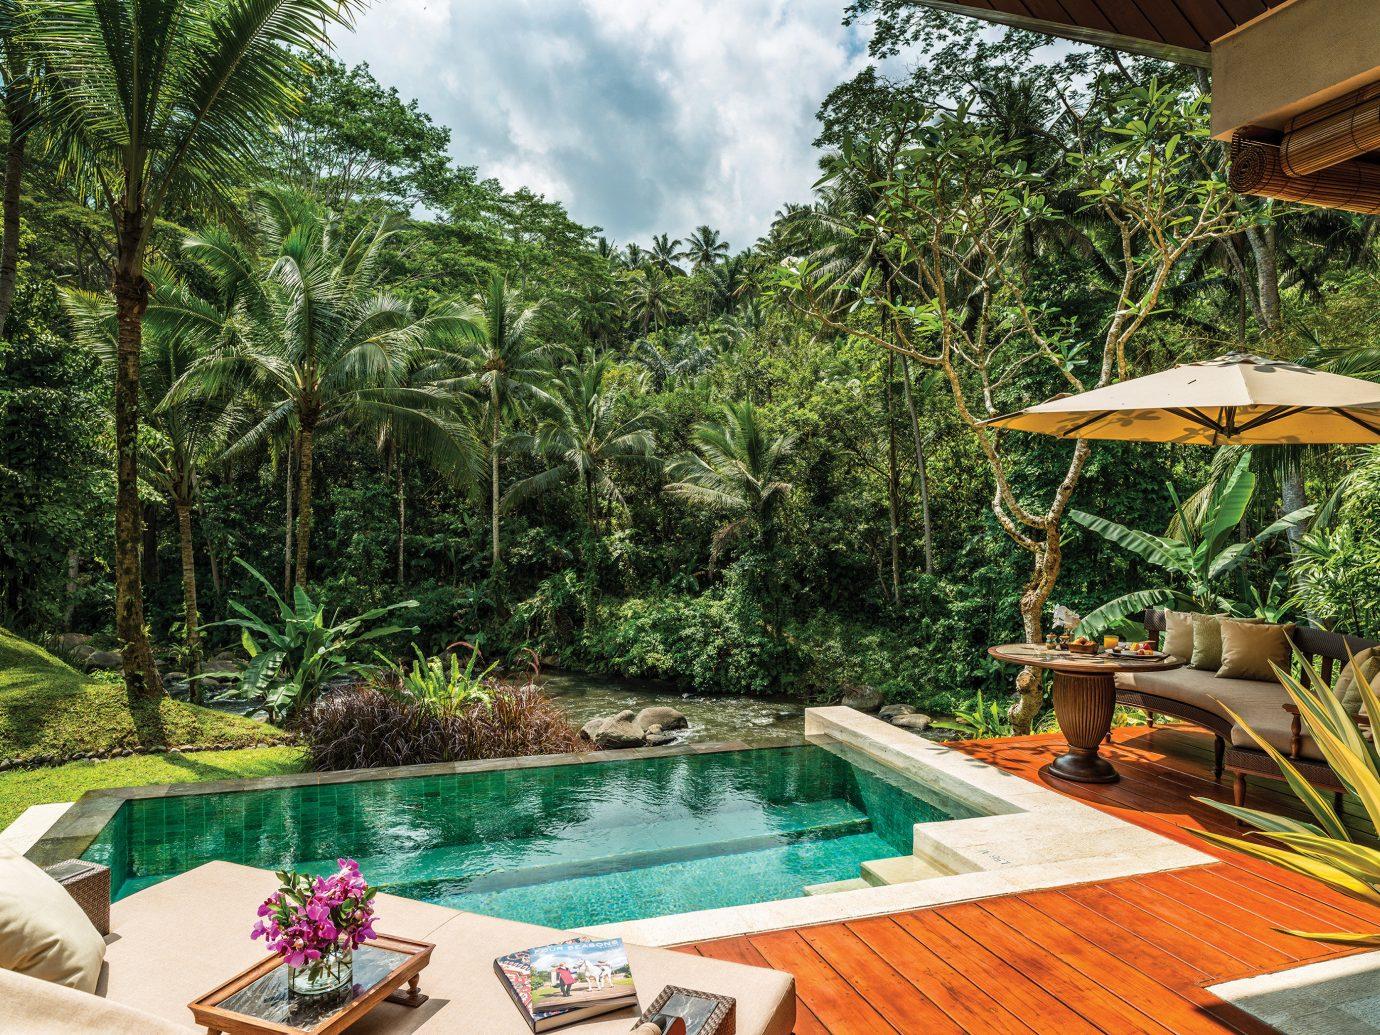 Honeymoon Jungle Luxury Offbeat Pool Romance Trip Ideas tree table outdoor swimming pool property Resort backyard estate Villa eco hotel Garden colorful furniture